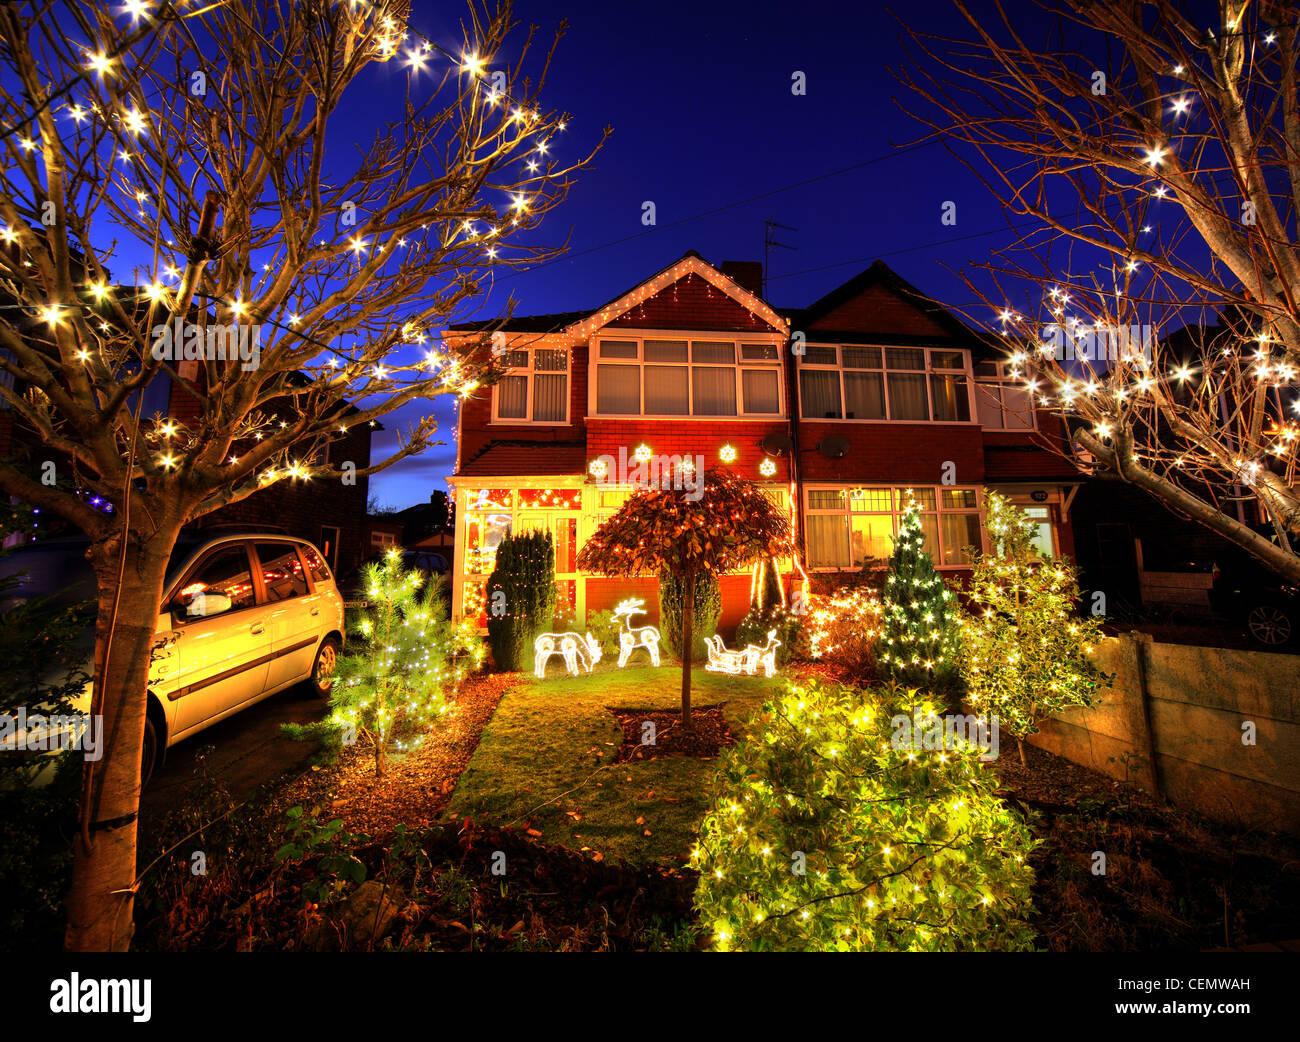 320,Padgate,Lane,Christmas,lights,Dusk,Warrington Cheshire England,UK,super,Xmas,illuminations,crazy,interesting,grass,lawn,car,DIY,do,it,yourself,Homebase,jolly,fun,humour,humourous,gotonysmith,320,Padgate,Lane,Christmas,lights,Dusk,Warrington Cheshire.jpg,gotonysmith,Warringtonians,Buy Pictures of,Buy Images Of